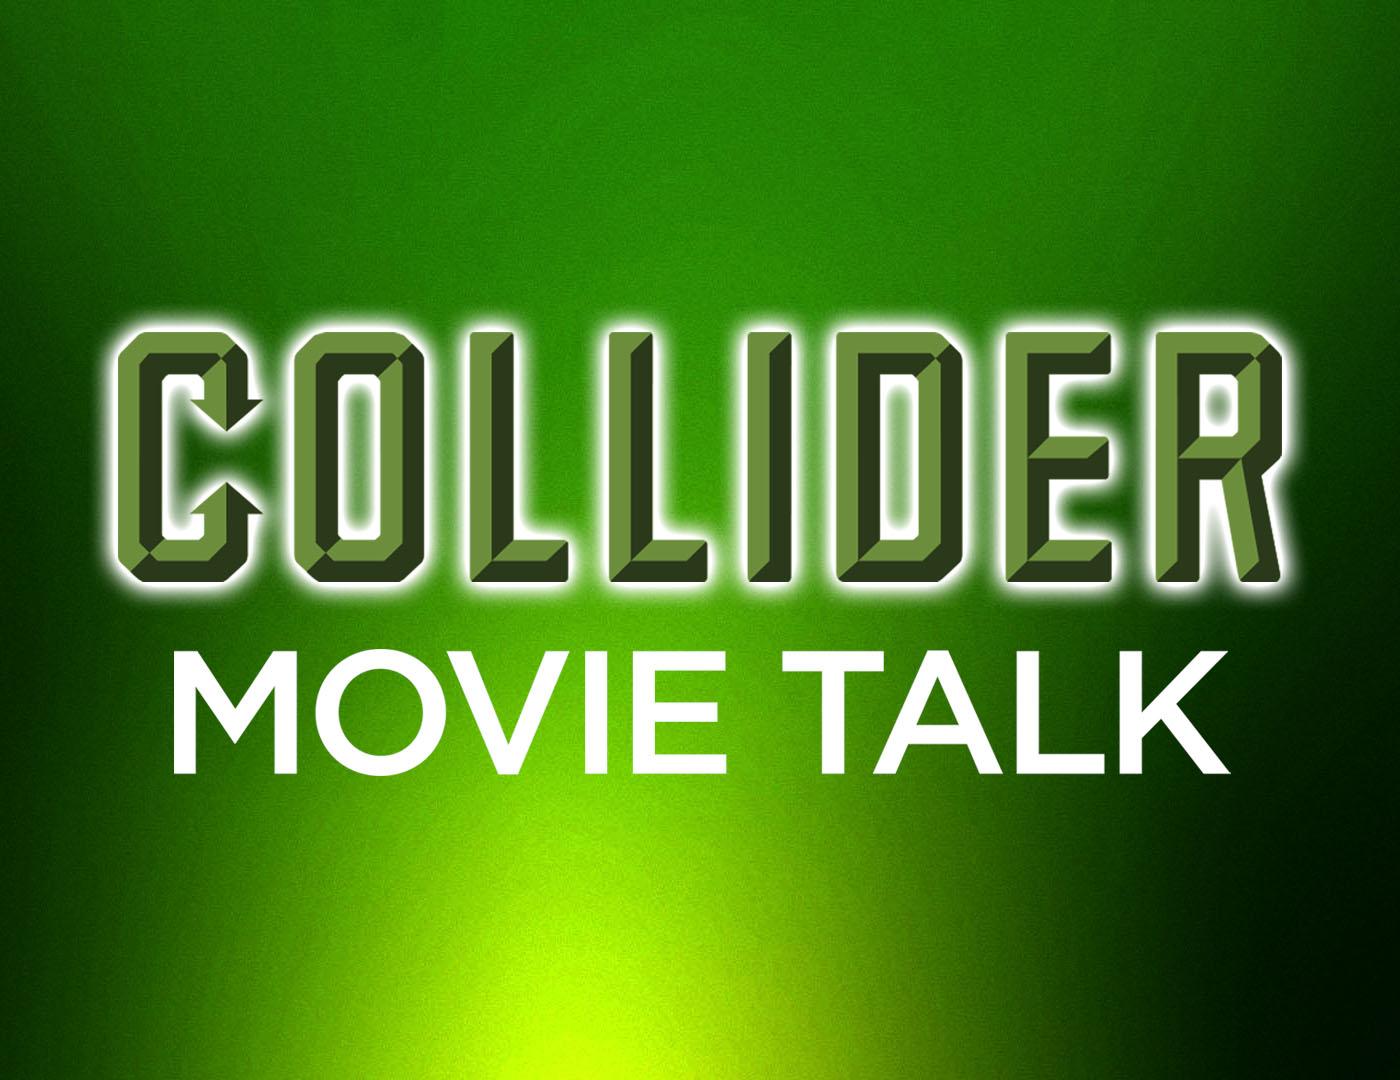 Collider Movie Talk - Star Wars, Avengers, Mad Max On Oscar Short List